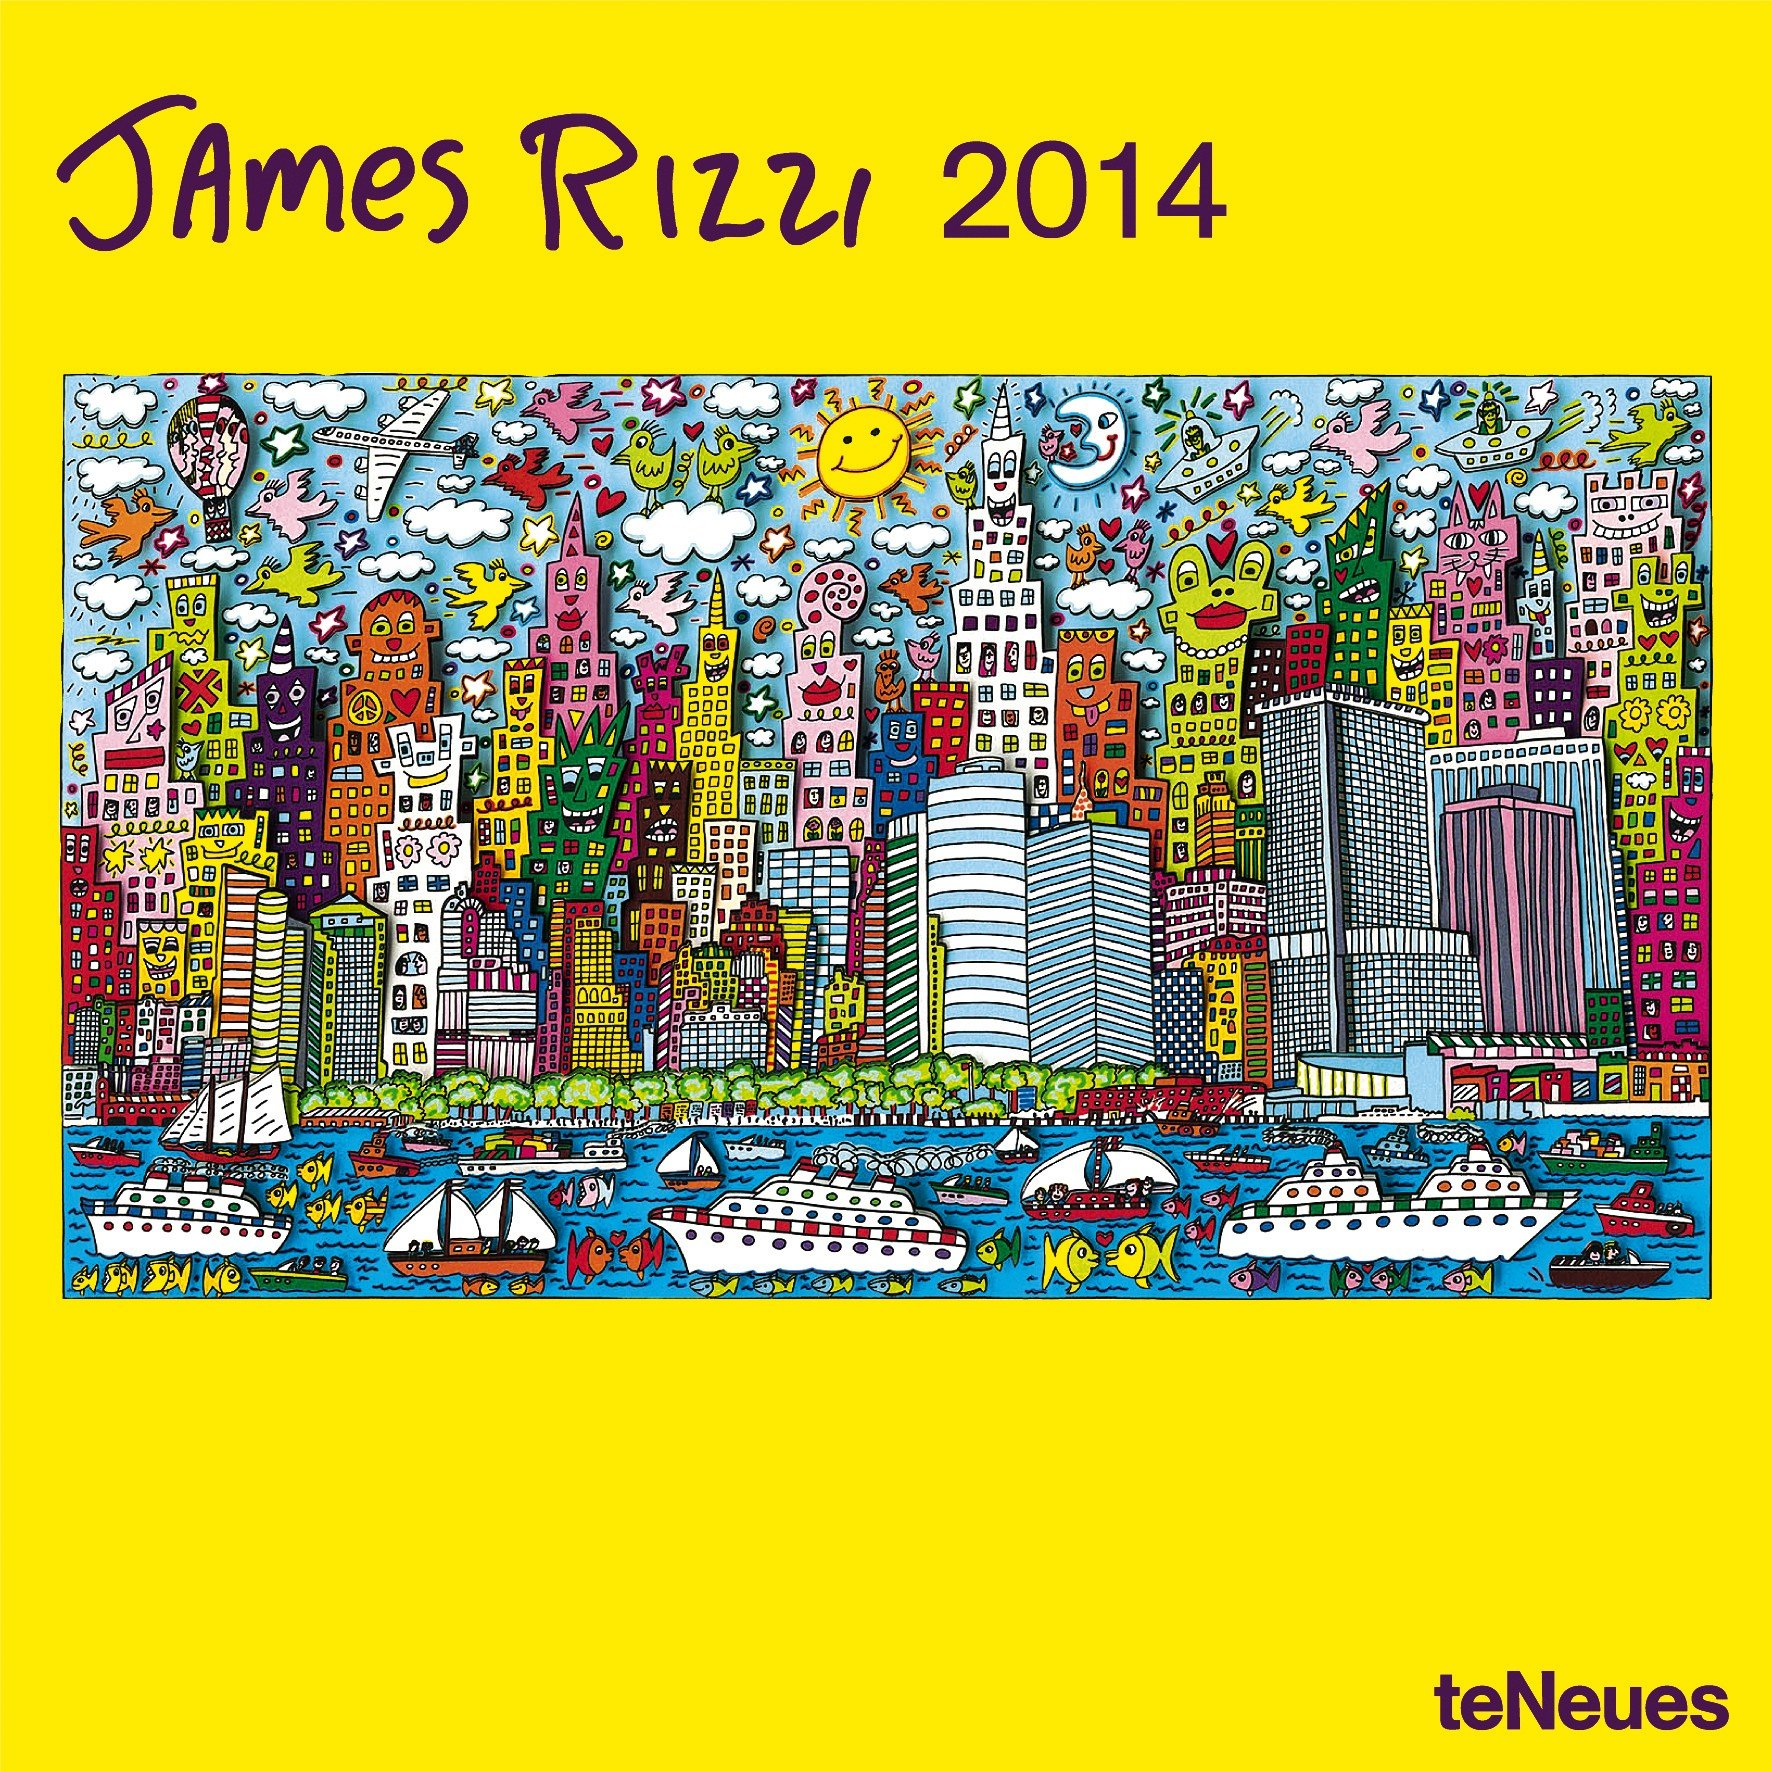 James Rizzi 2014 EU